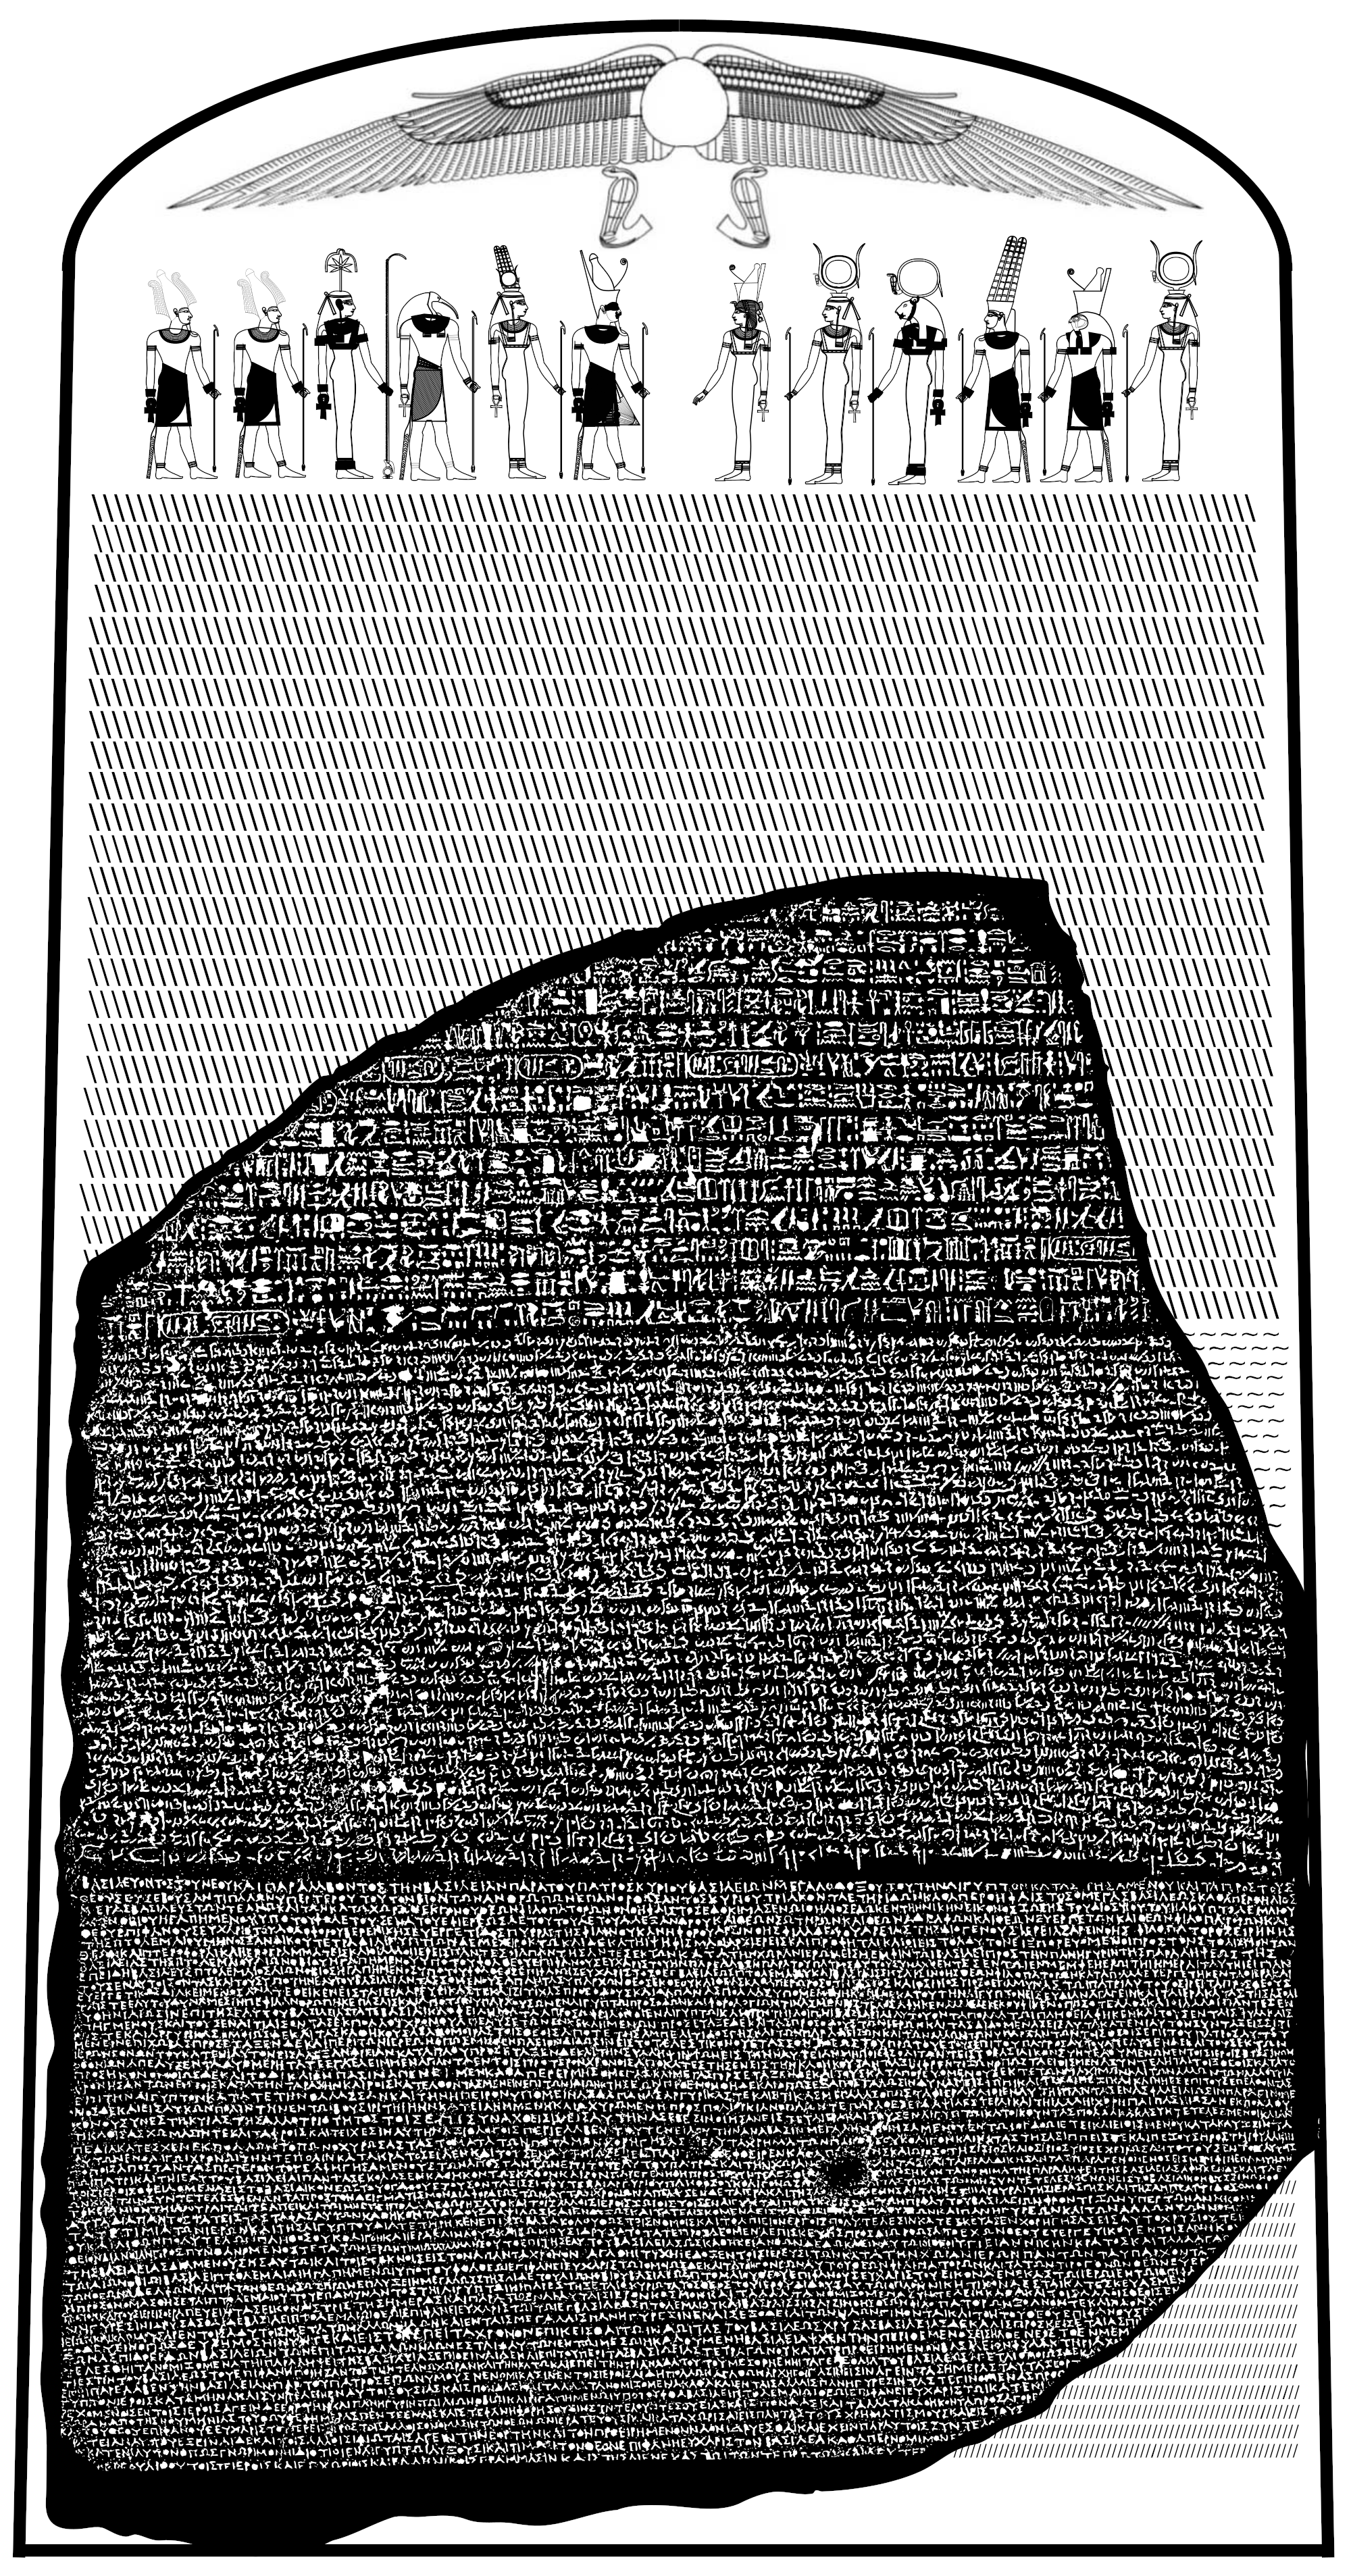 2000px-RosettaStoneAsPartOfOriginalStele_revised.svg_white background.png